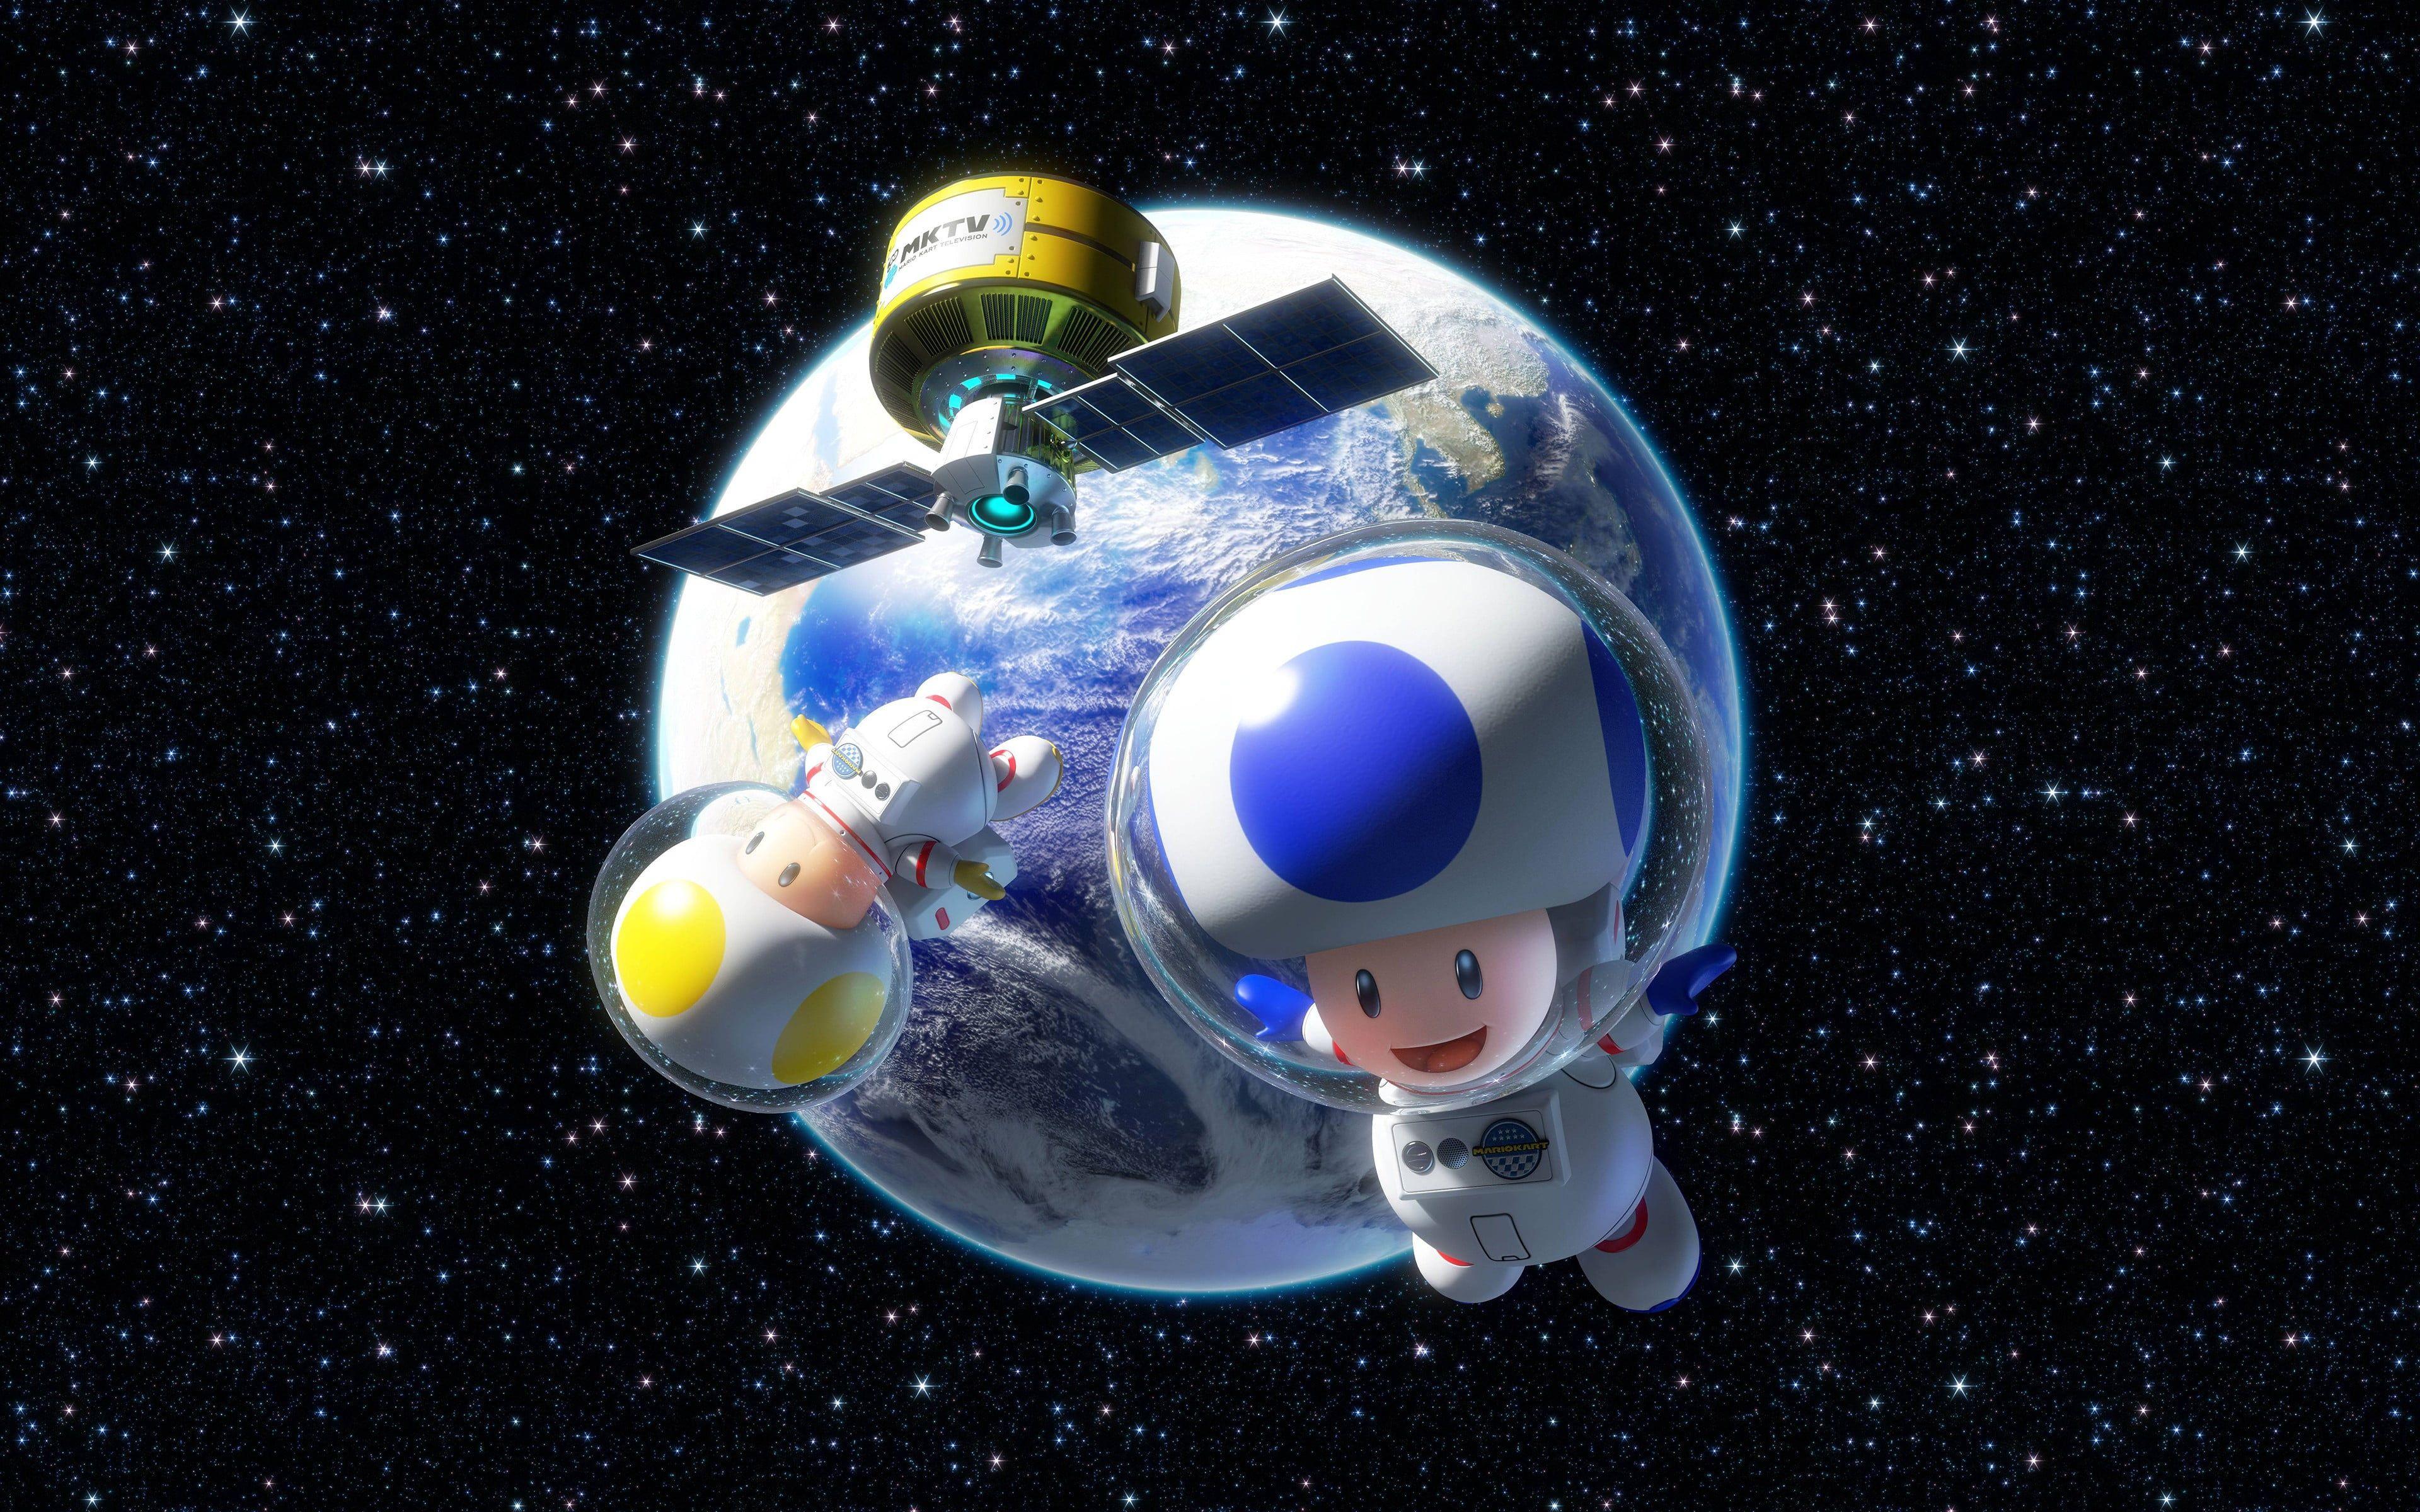 Super Mario Toad Astronaut Digital Wallpaper Toad Character Space Video Games Mario Kart 8 Nintendo Astr In 2021 Super Mario Digital Wallpaper Character Wallpaper